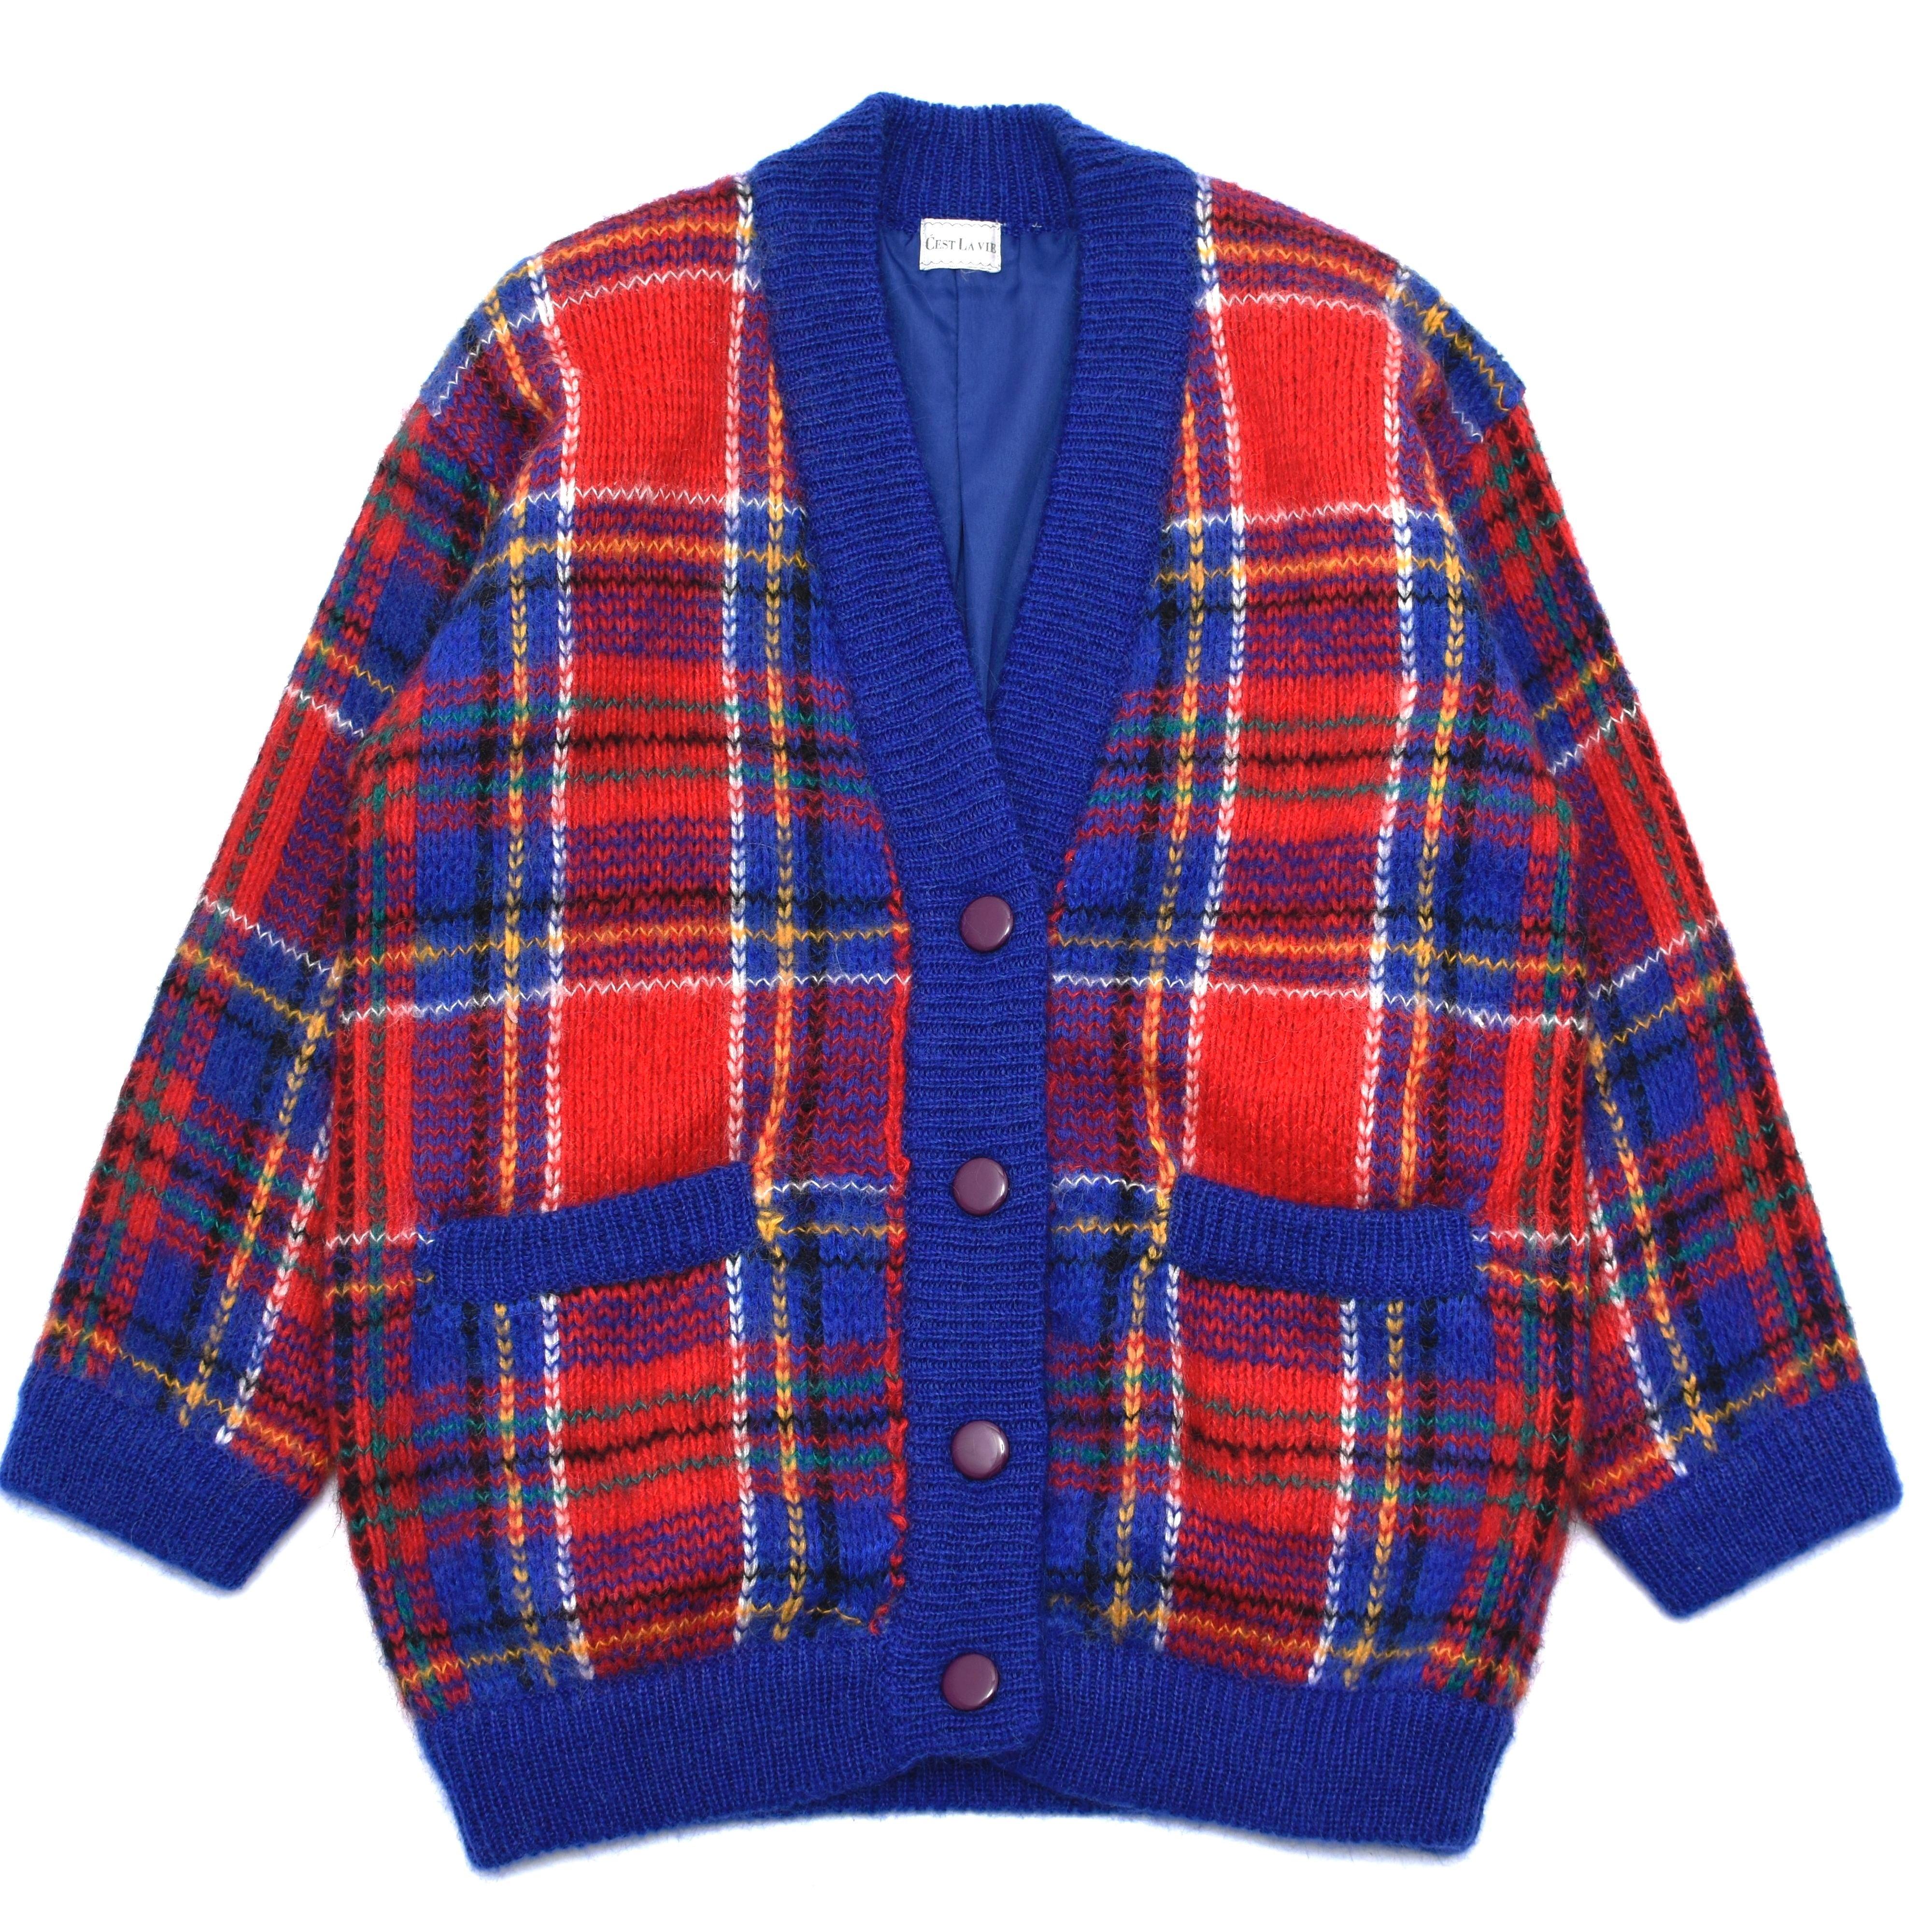 Unisex Check wool knit cardigan